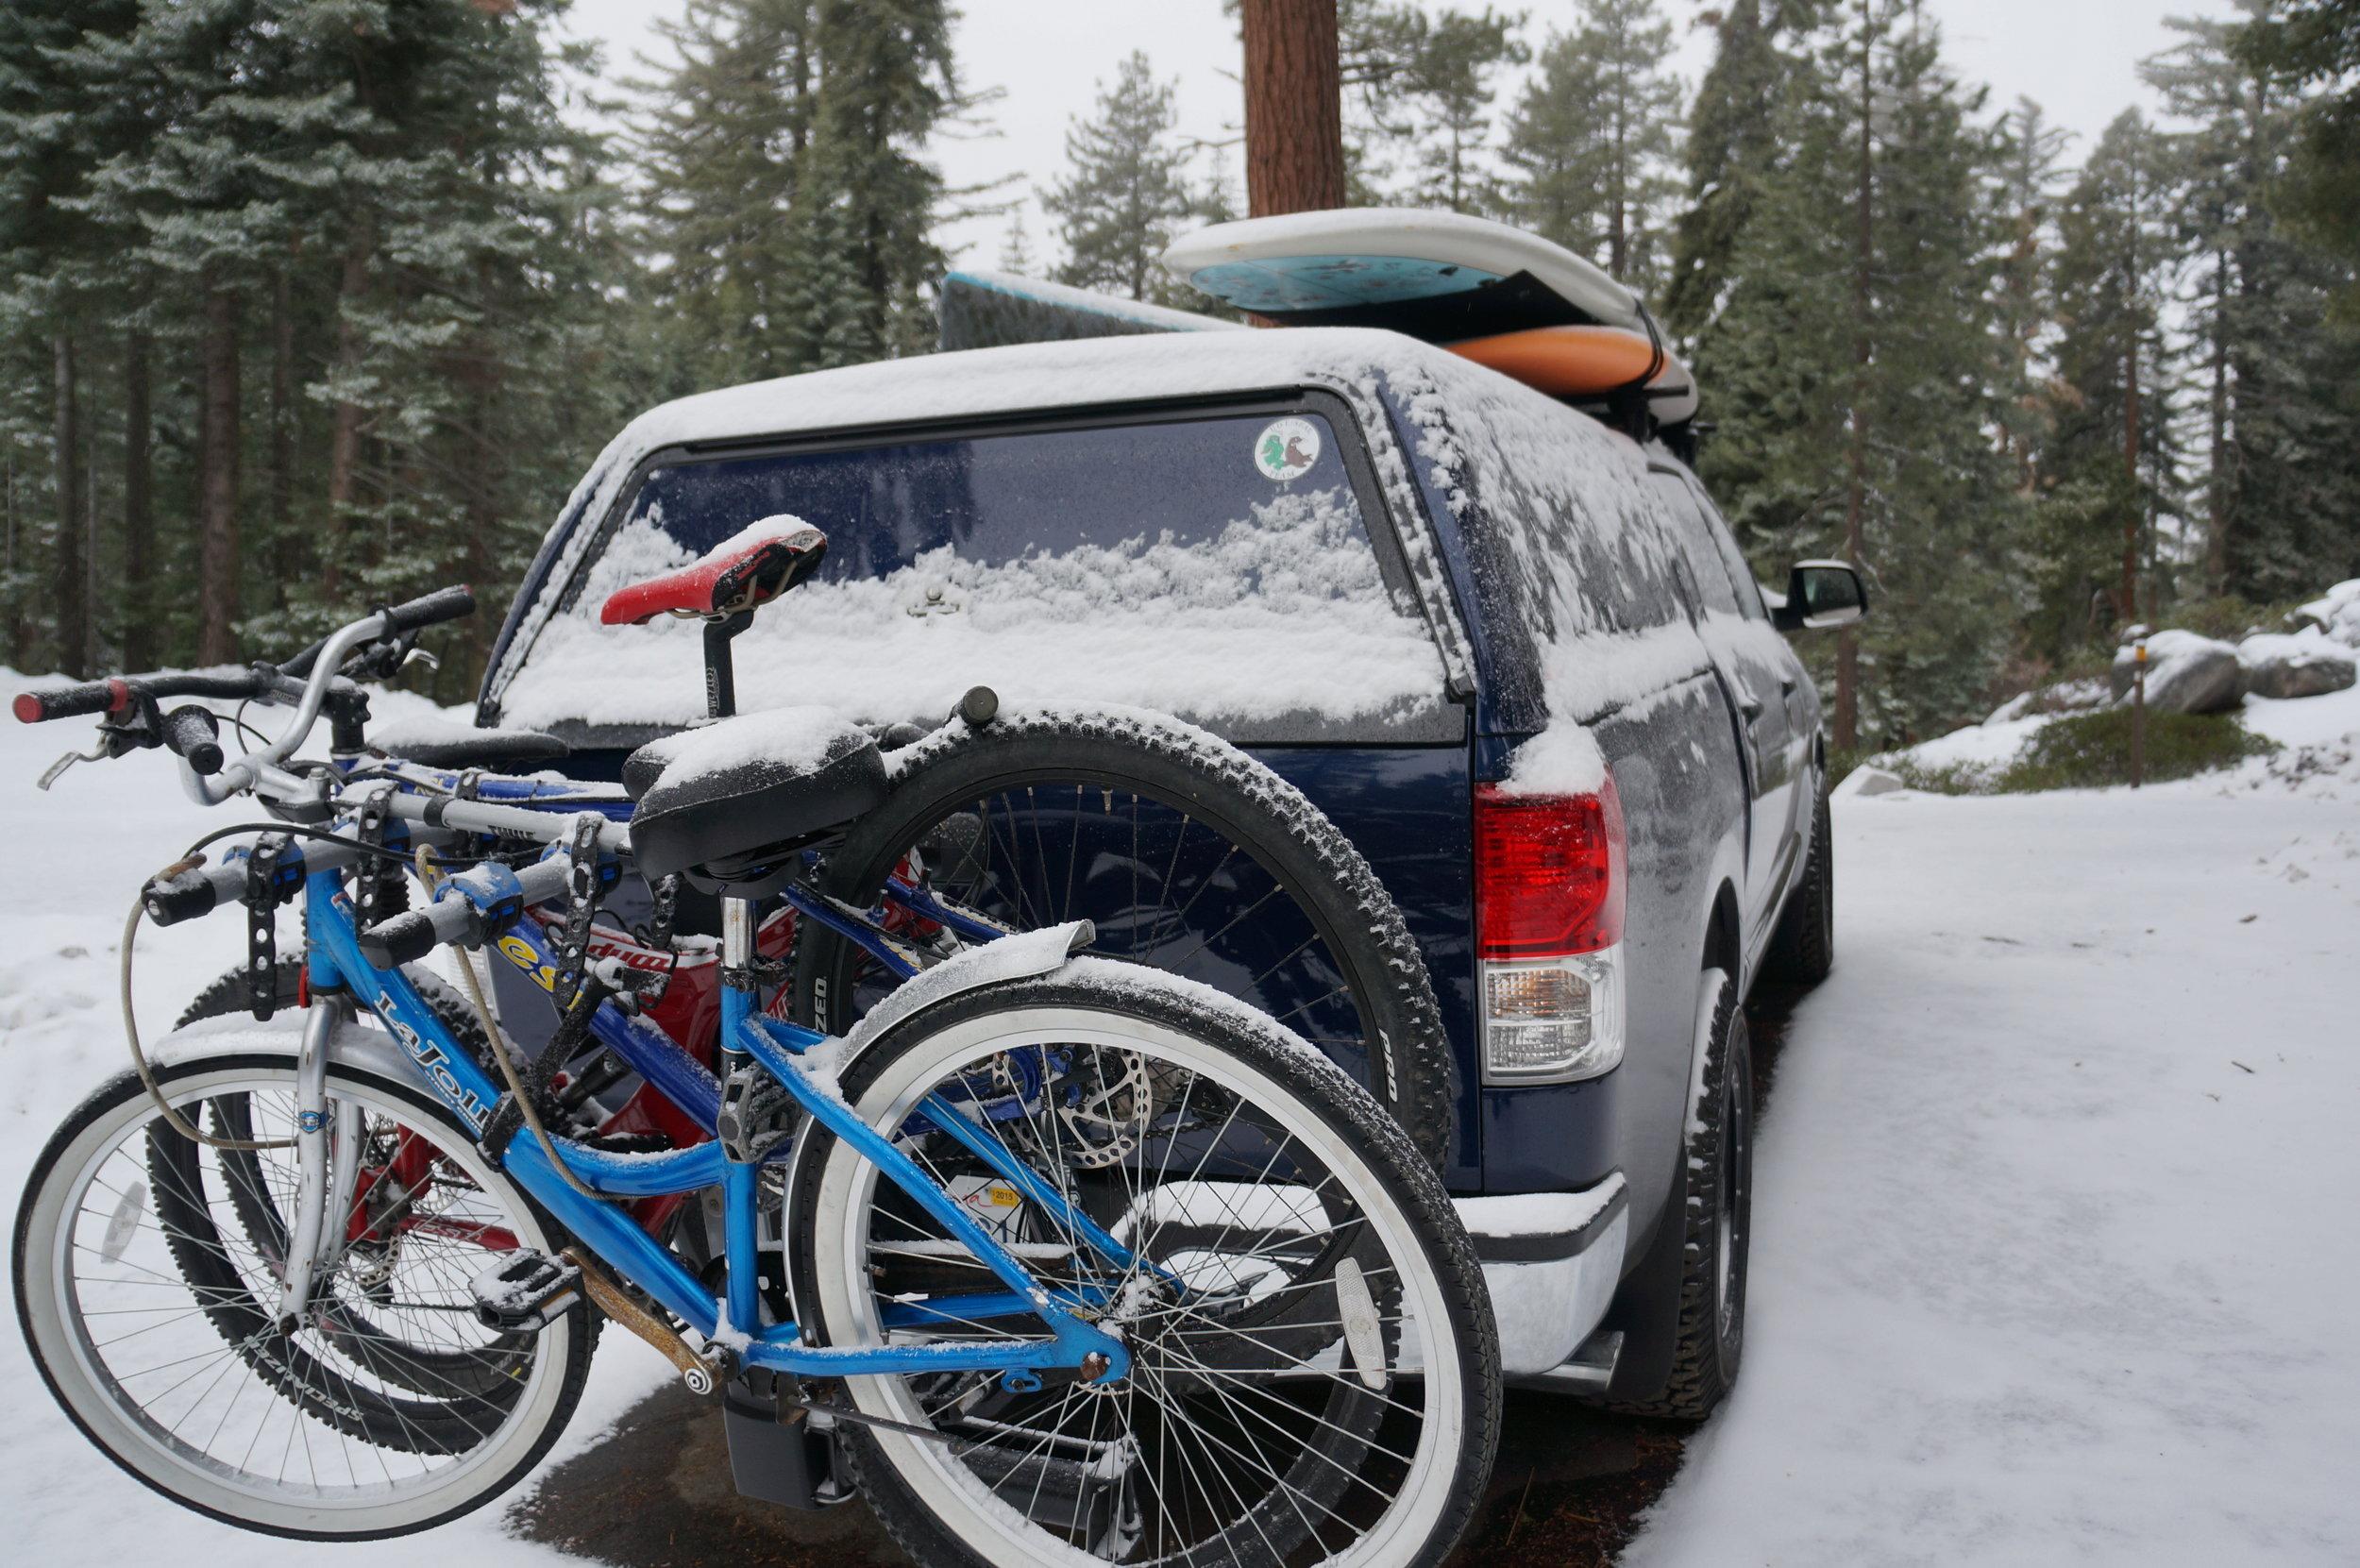 Truck paddleboardSequoias california outdoors snow2015-02-28 09.04.38 (1).jpg